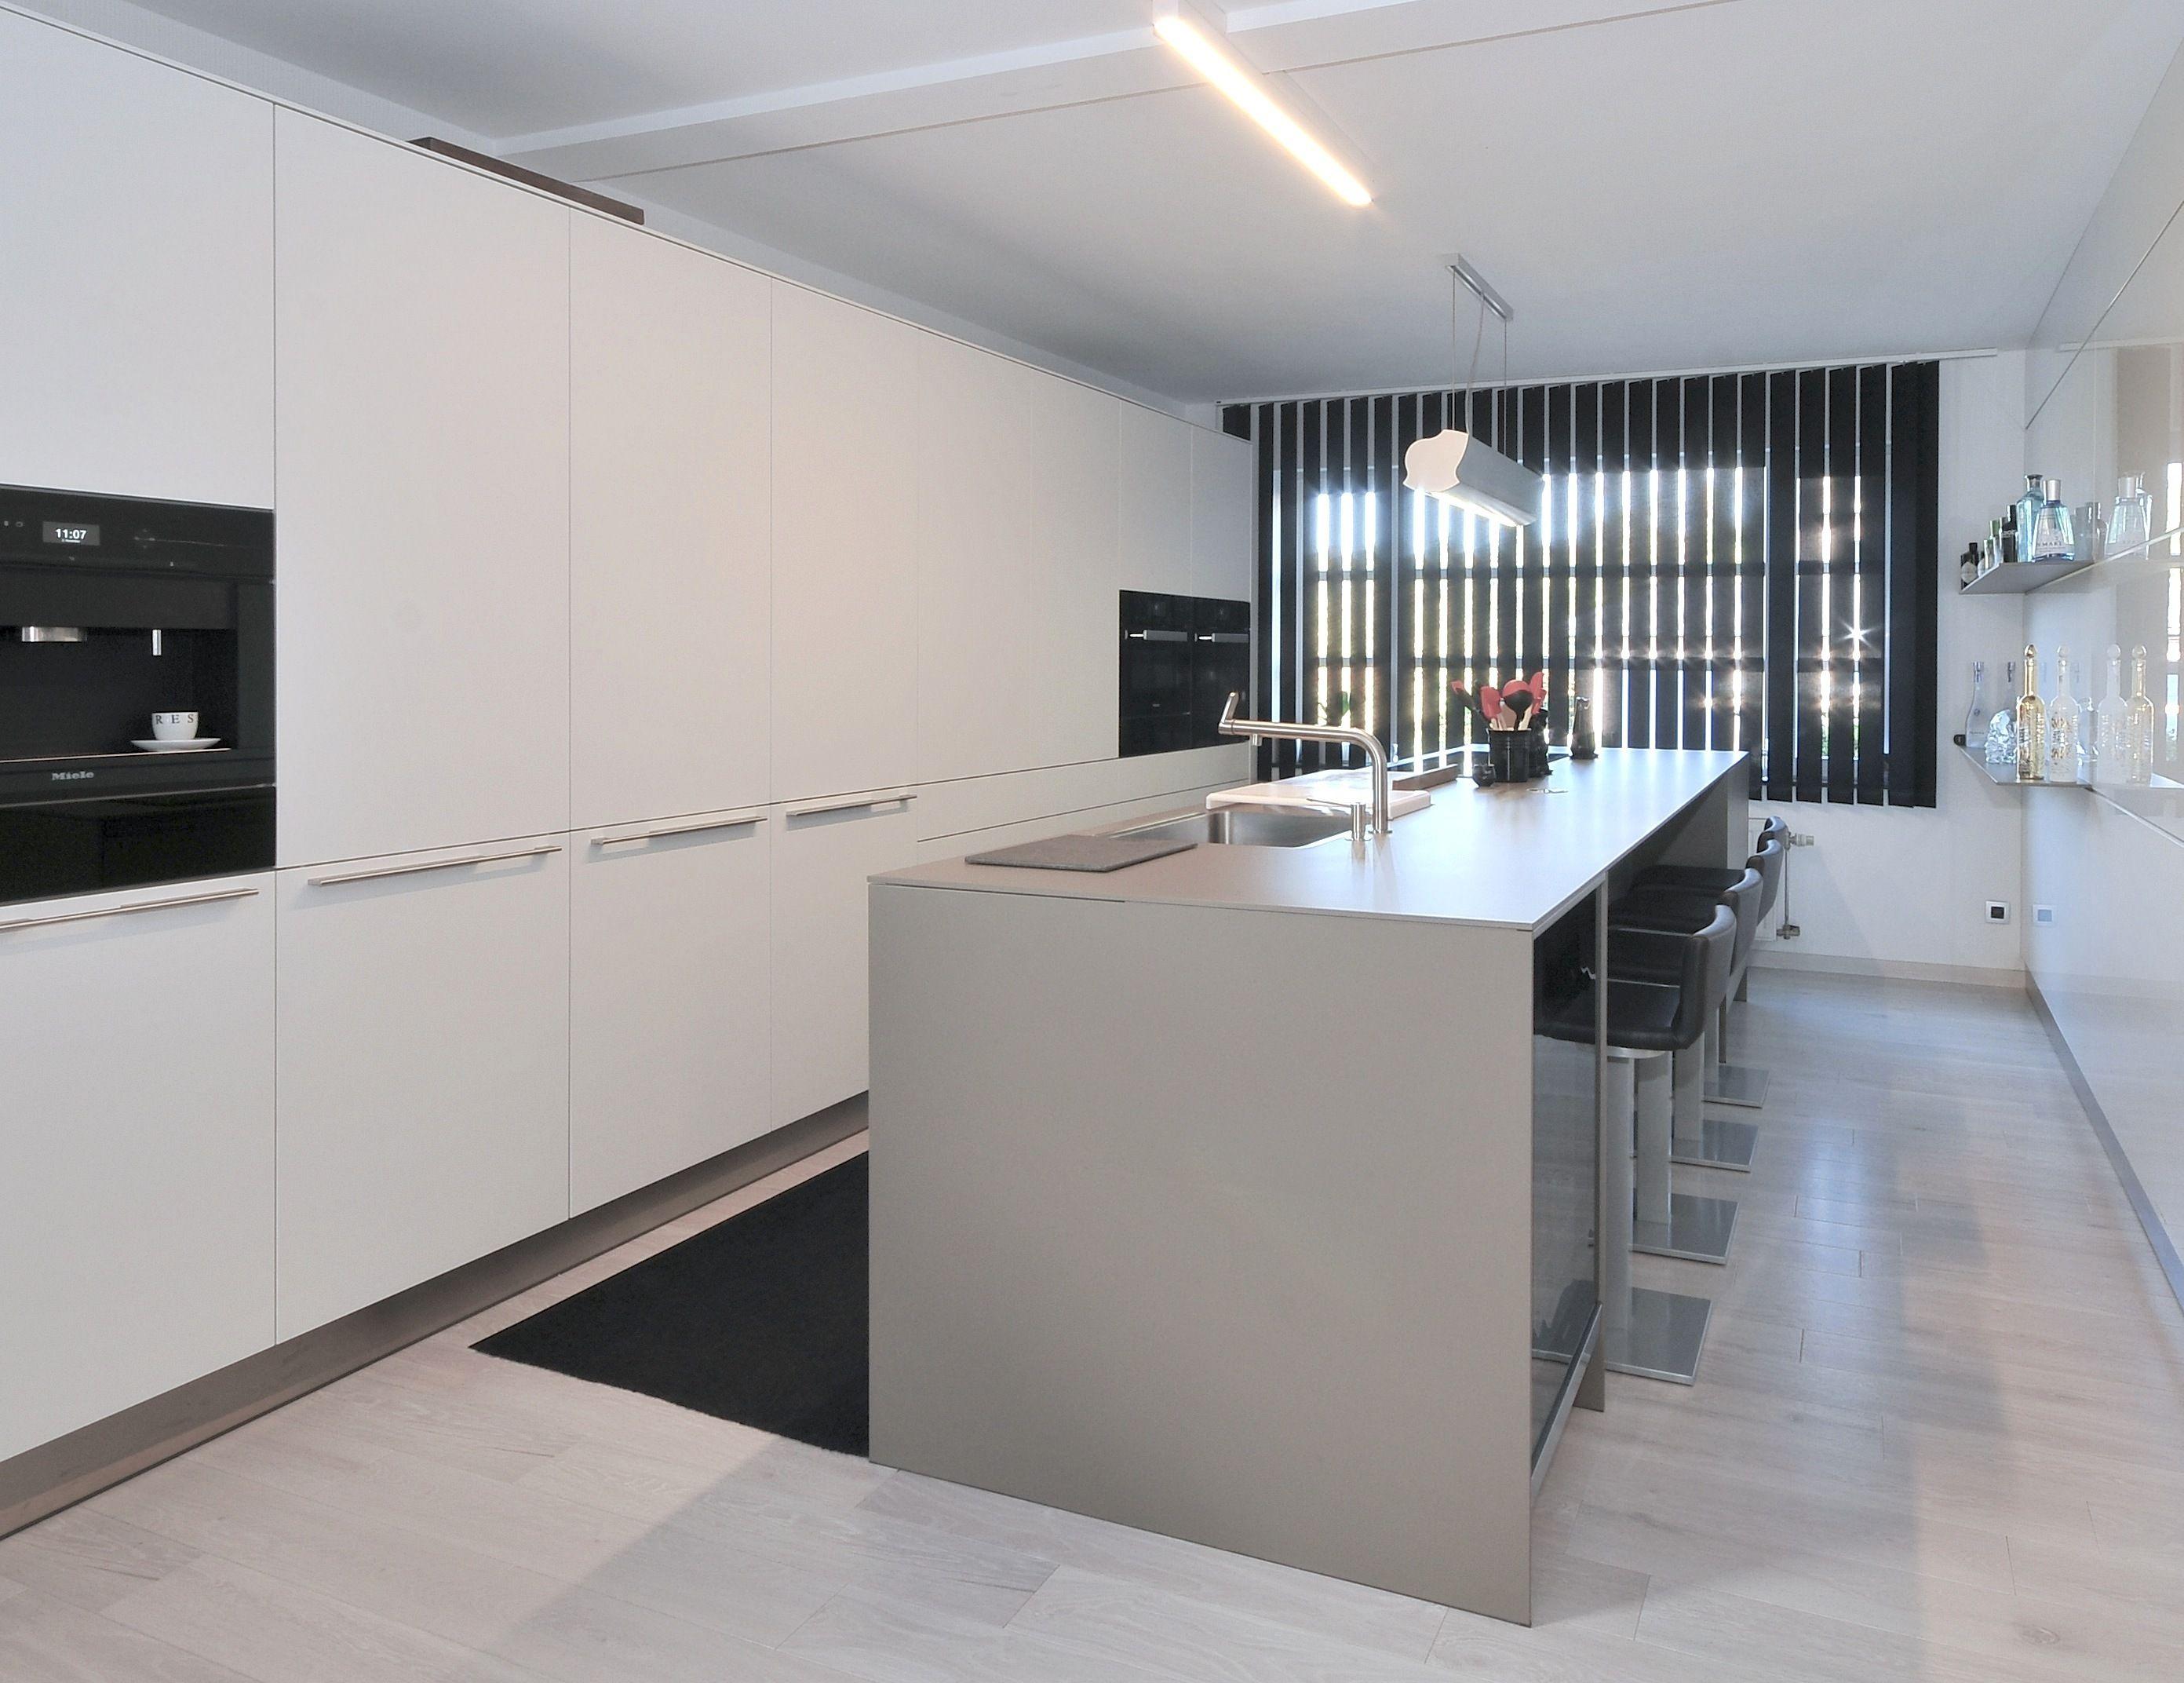 Keuken Rvs Wandpanelen : Bulthaup b3 laminaat alpine wit leem wandpanelen acryl hoogglans